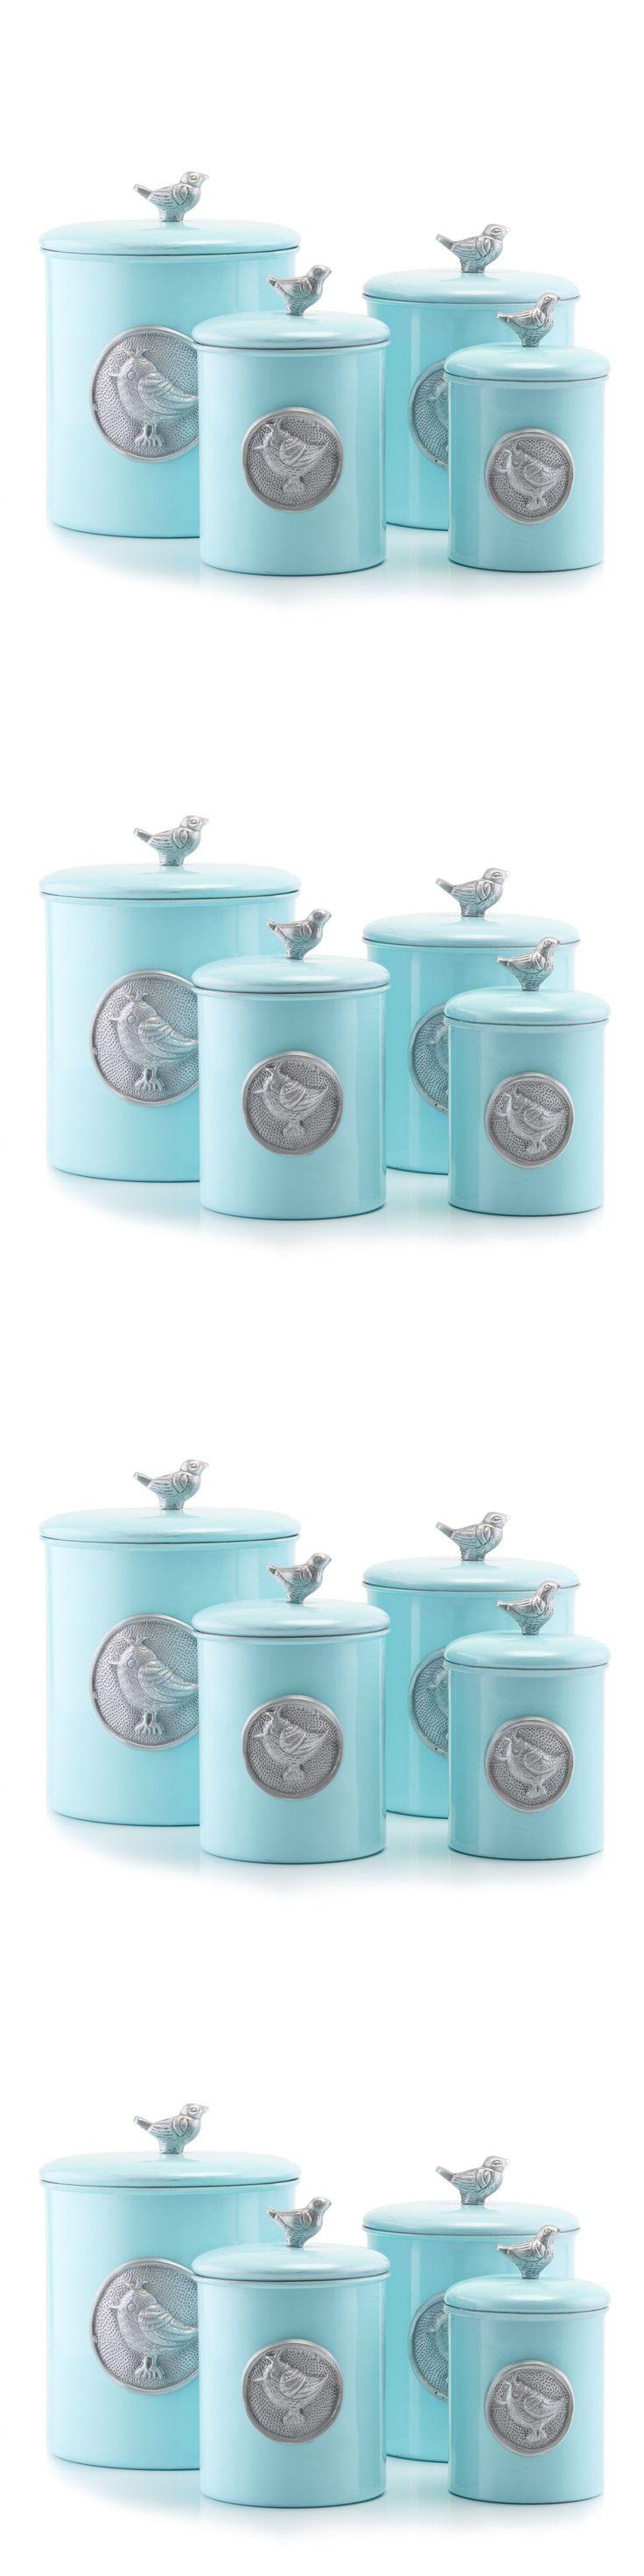 best 25 tea coffee sugar jars ideas only on pinterest tea and canisters and jars 20654 blue canister set kitchen storage sugar jar flour tea coffee lid